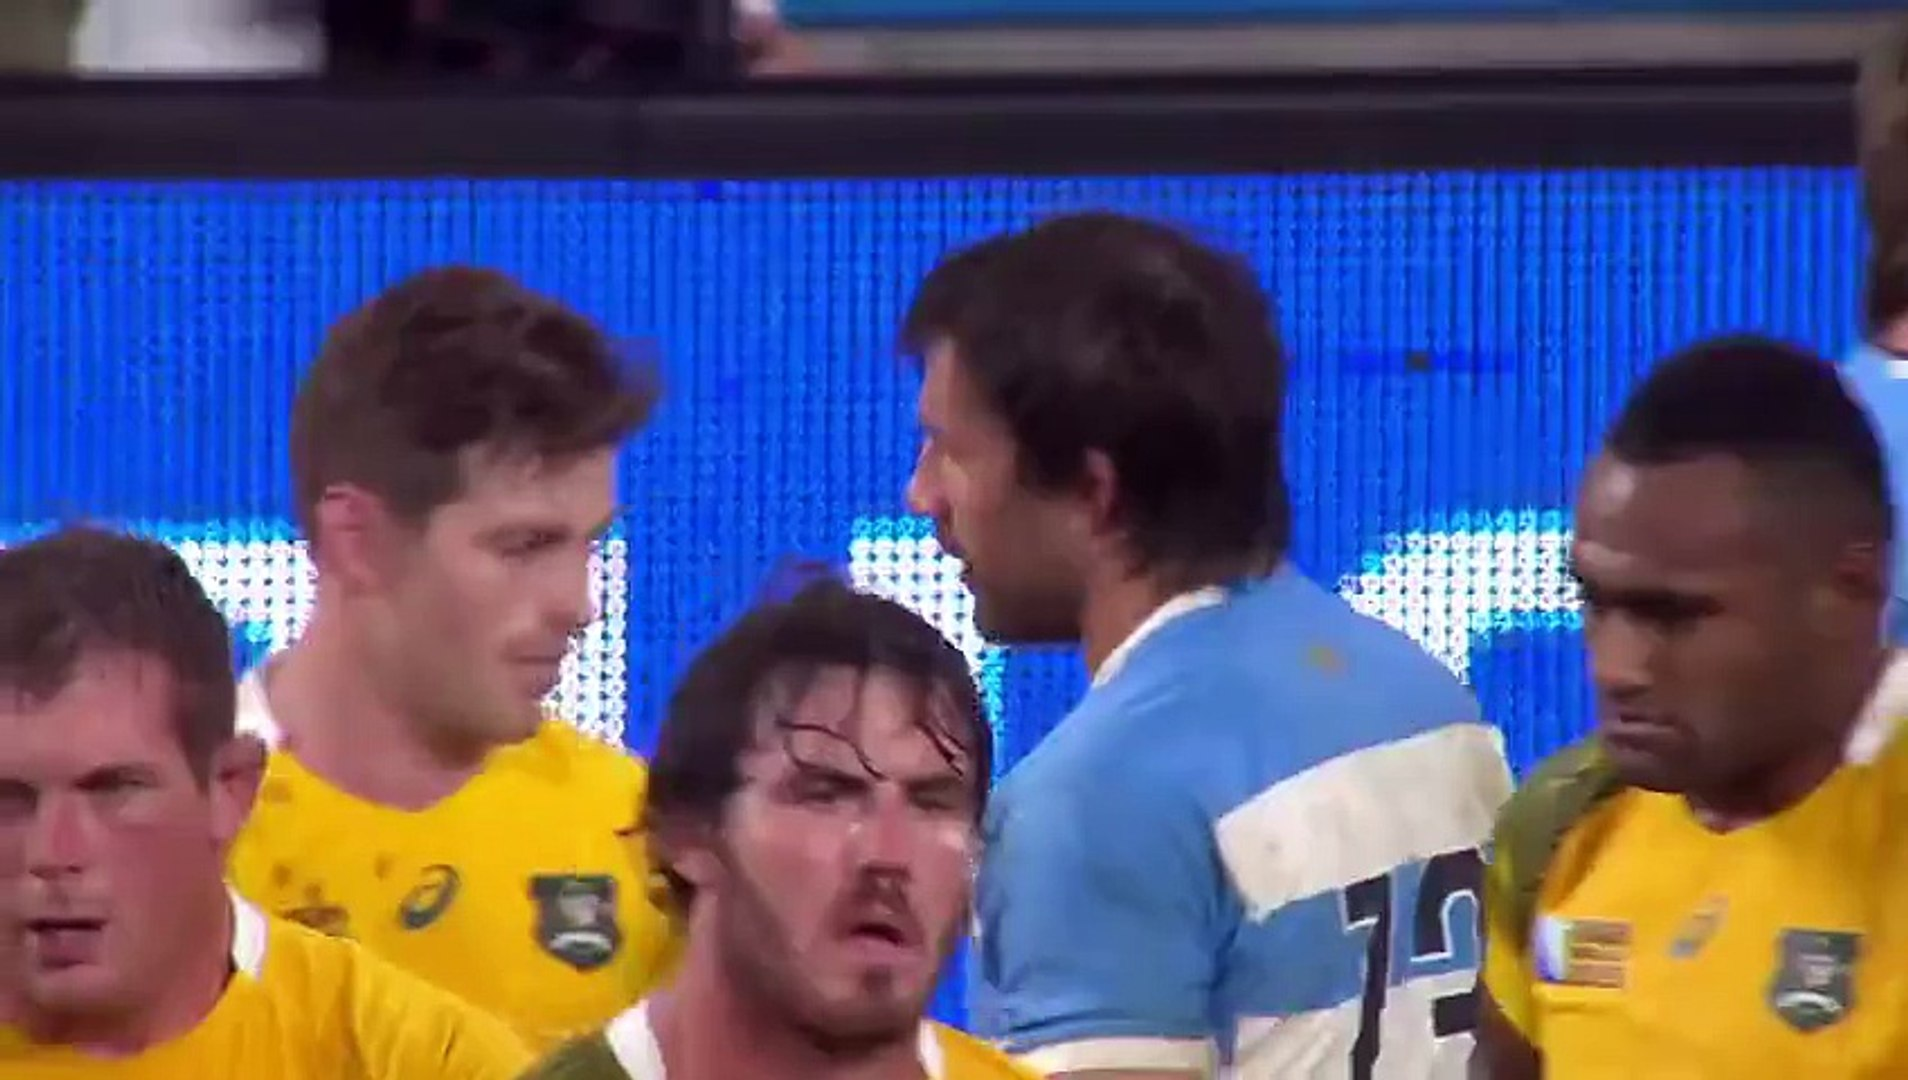 Argentina v Australia - Blood, sweat and tears